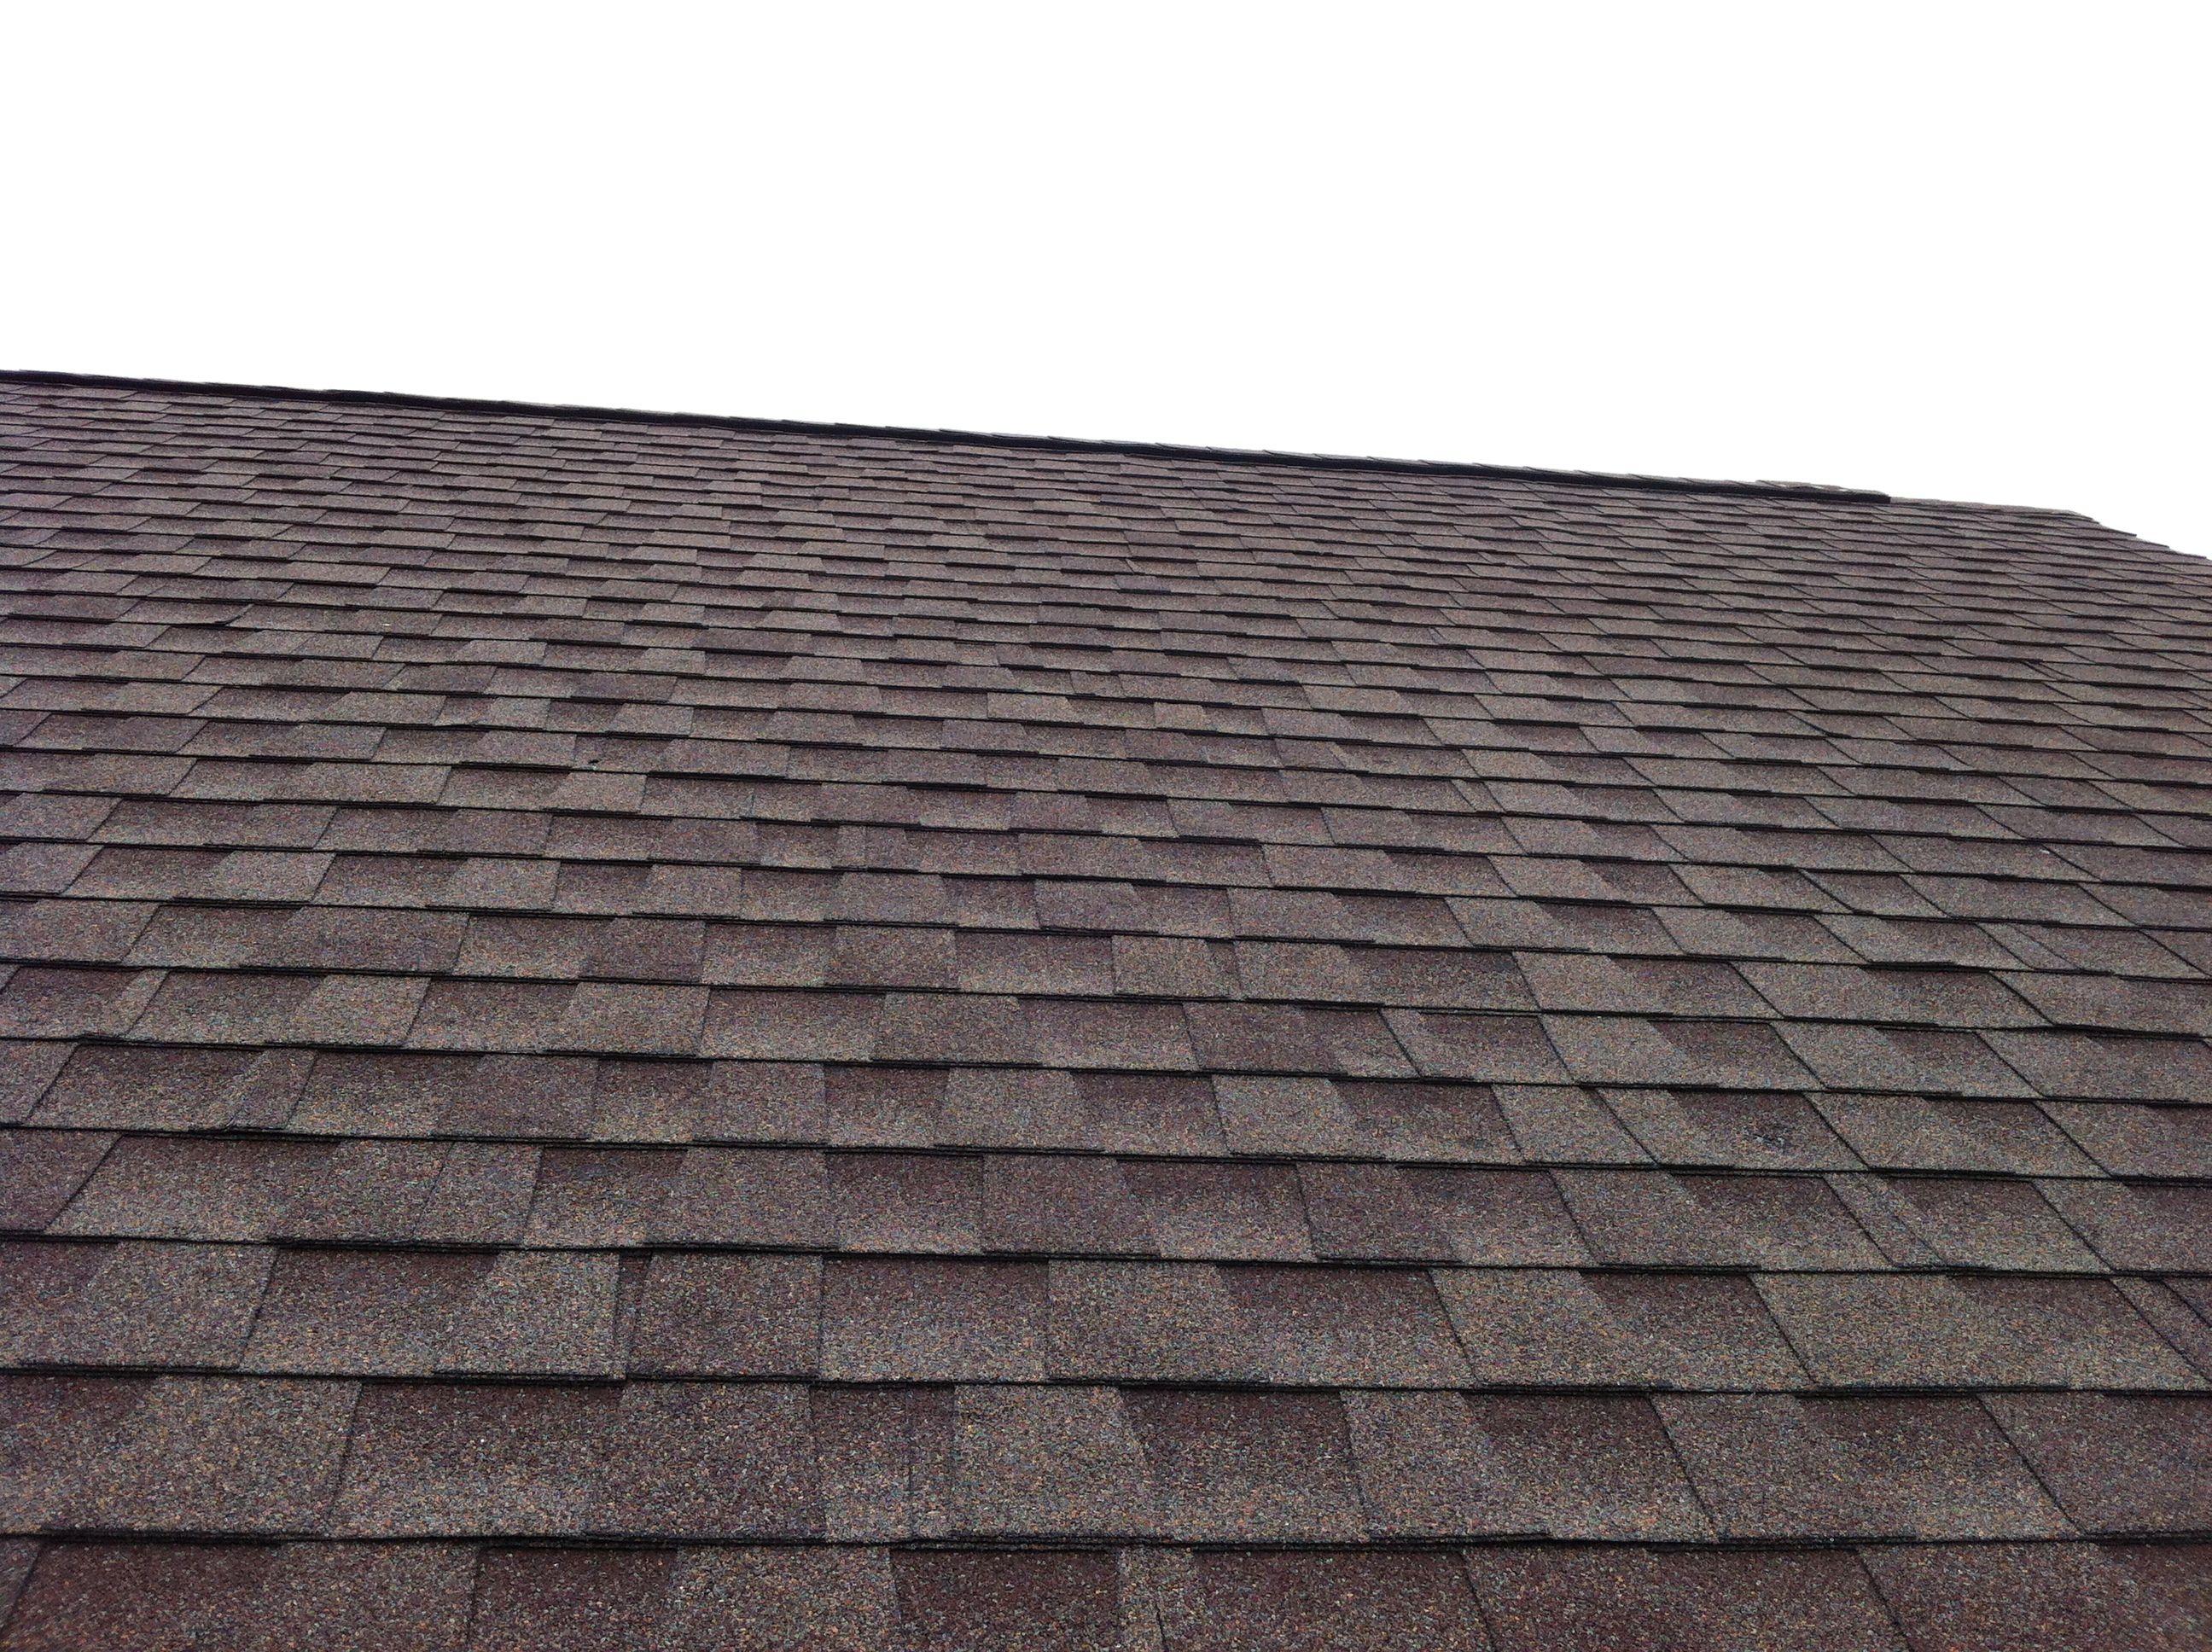 Tamko Roofing Shingles Roof Shingles Shingling Composition Shingles